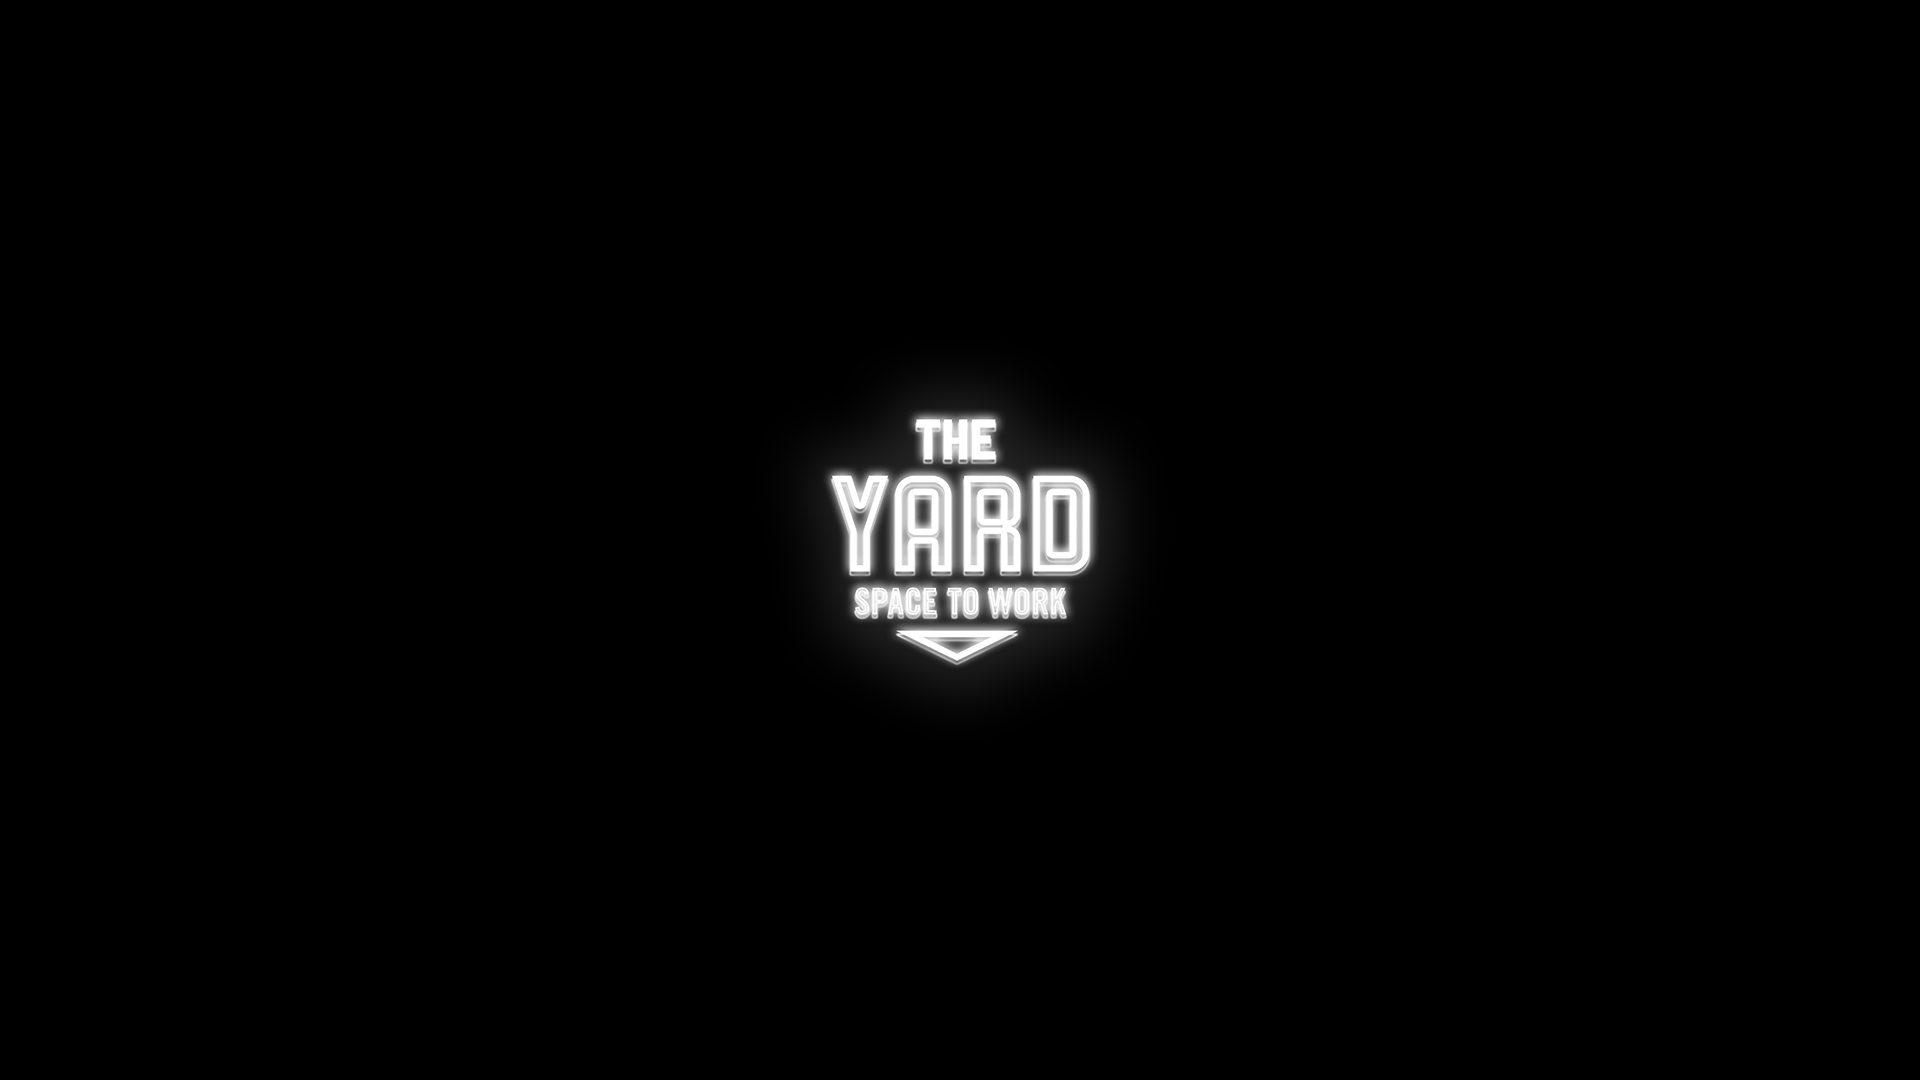 The Yard Website Design and Development